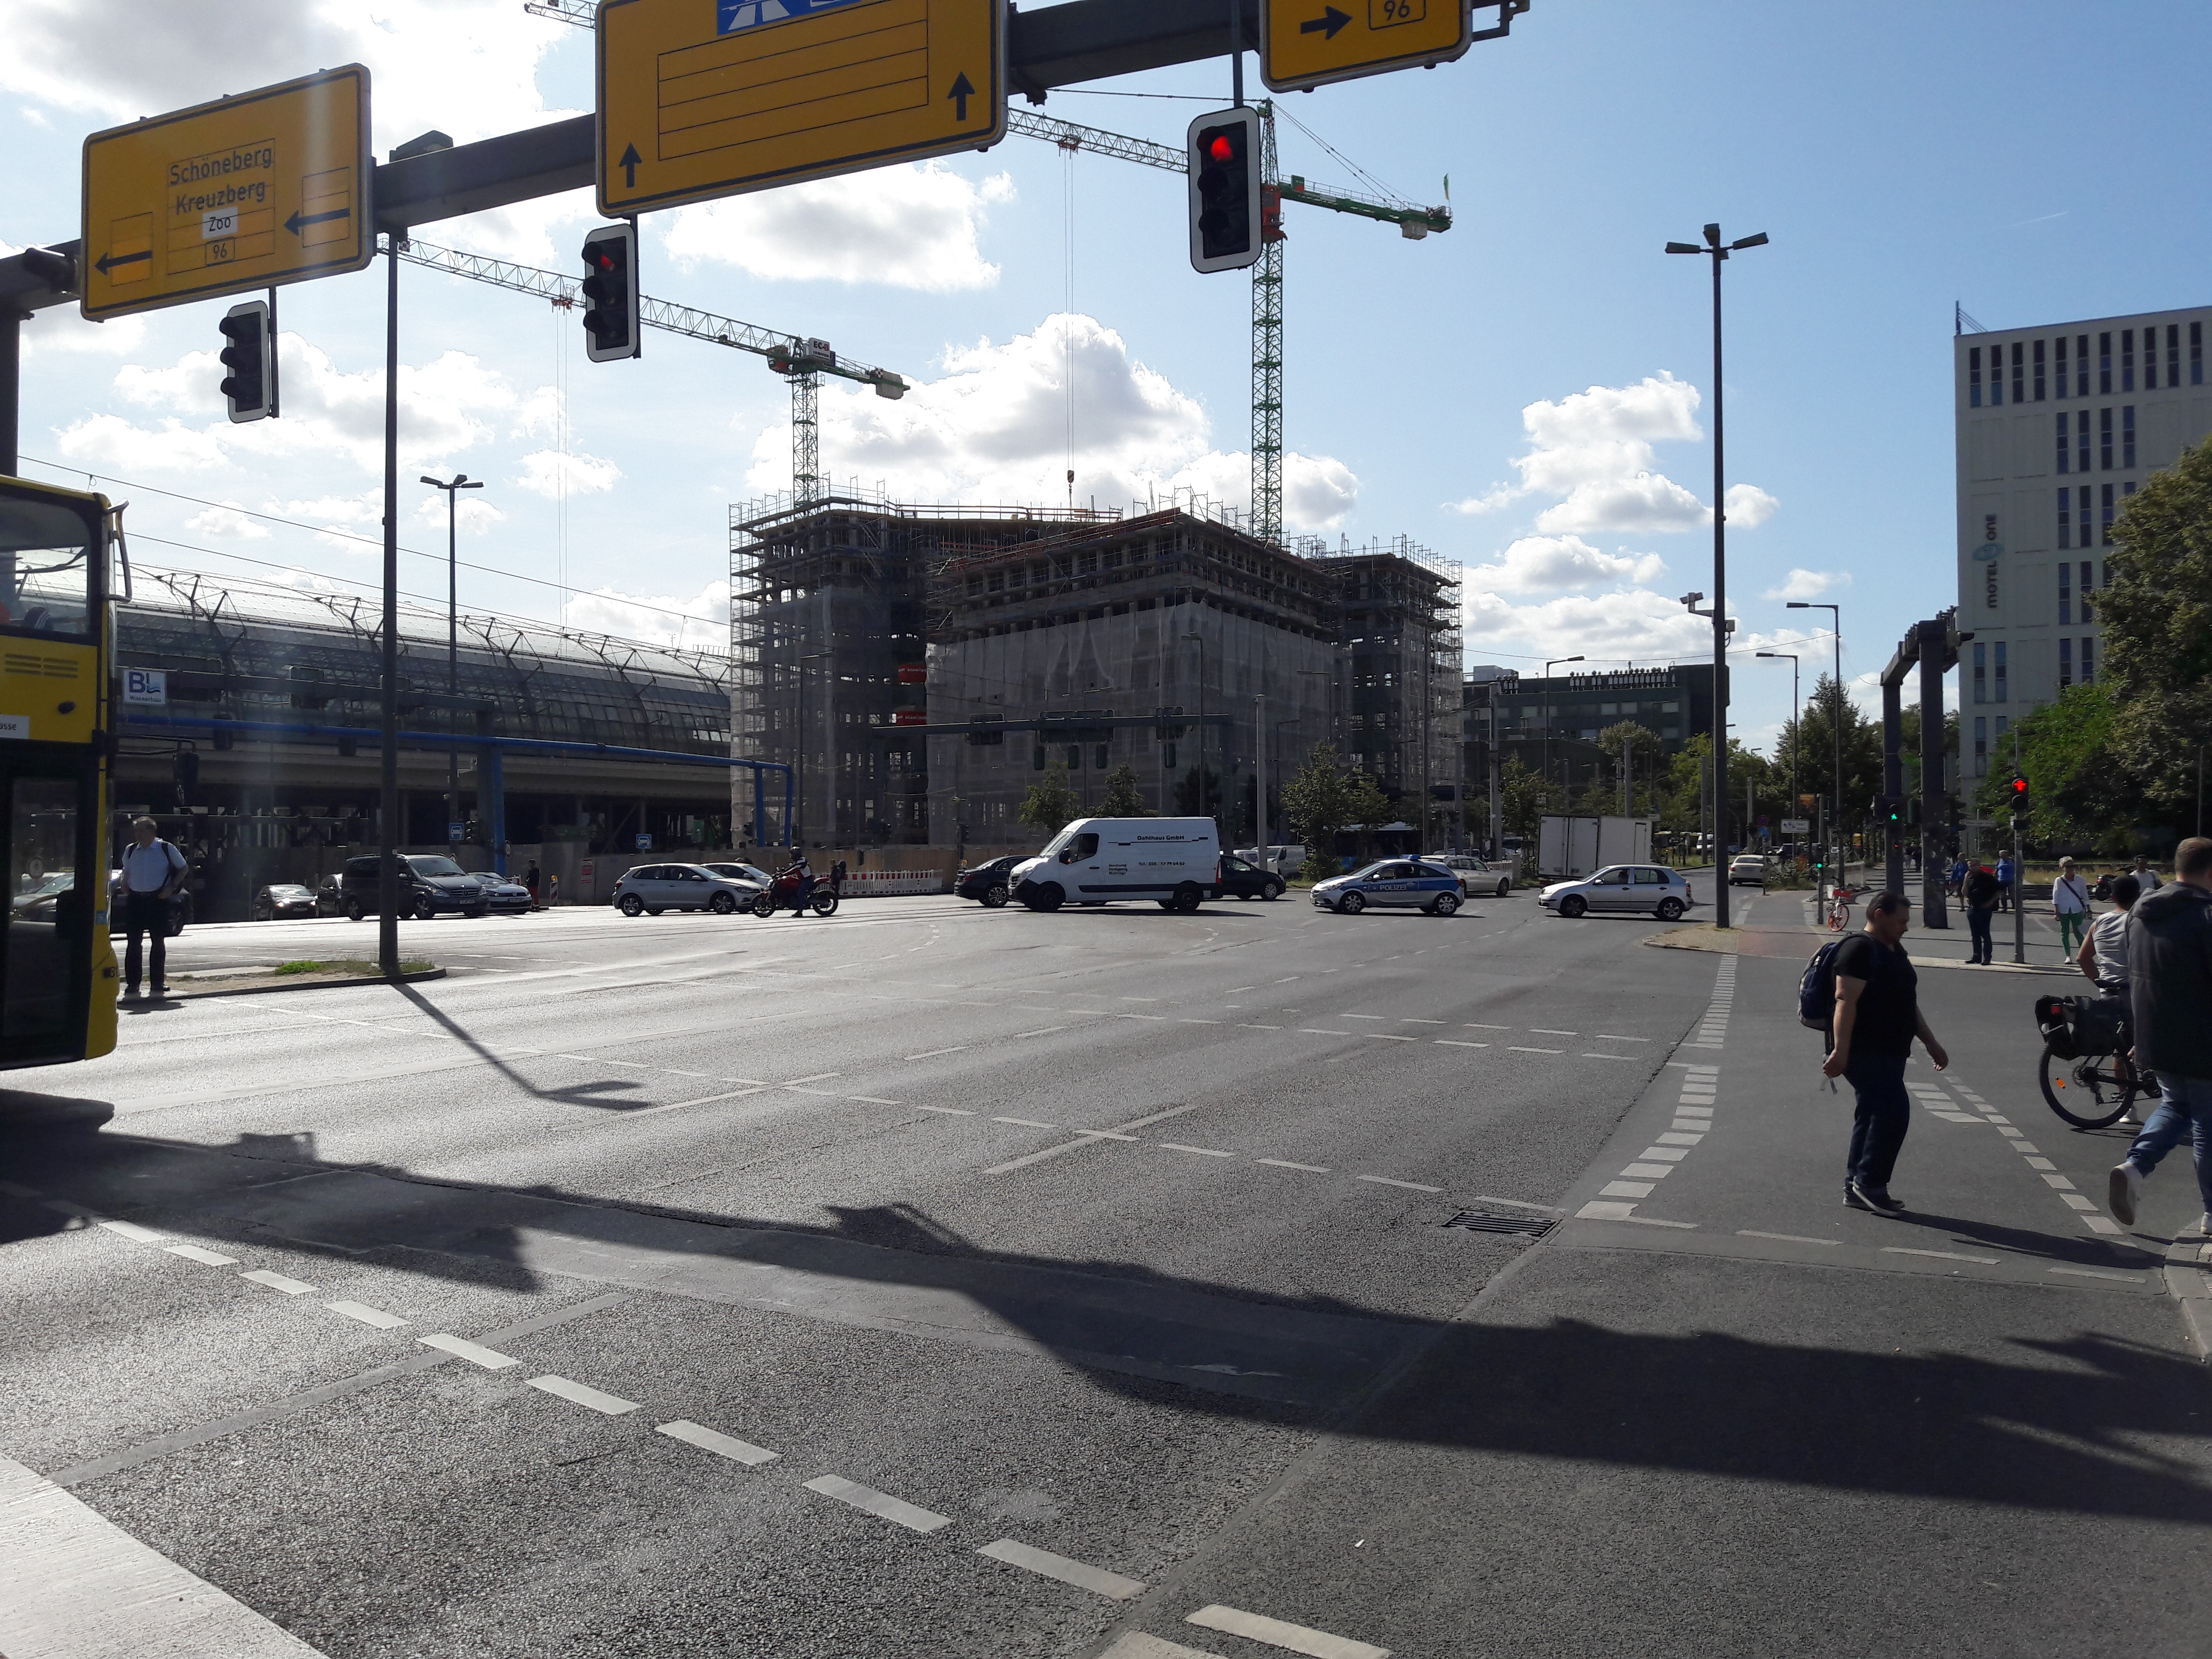 Edge-Berlin-Hauptbahnhof.jpg